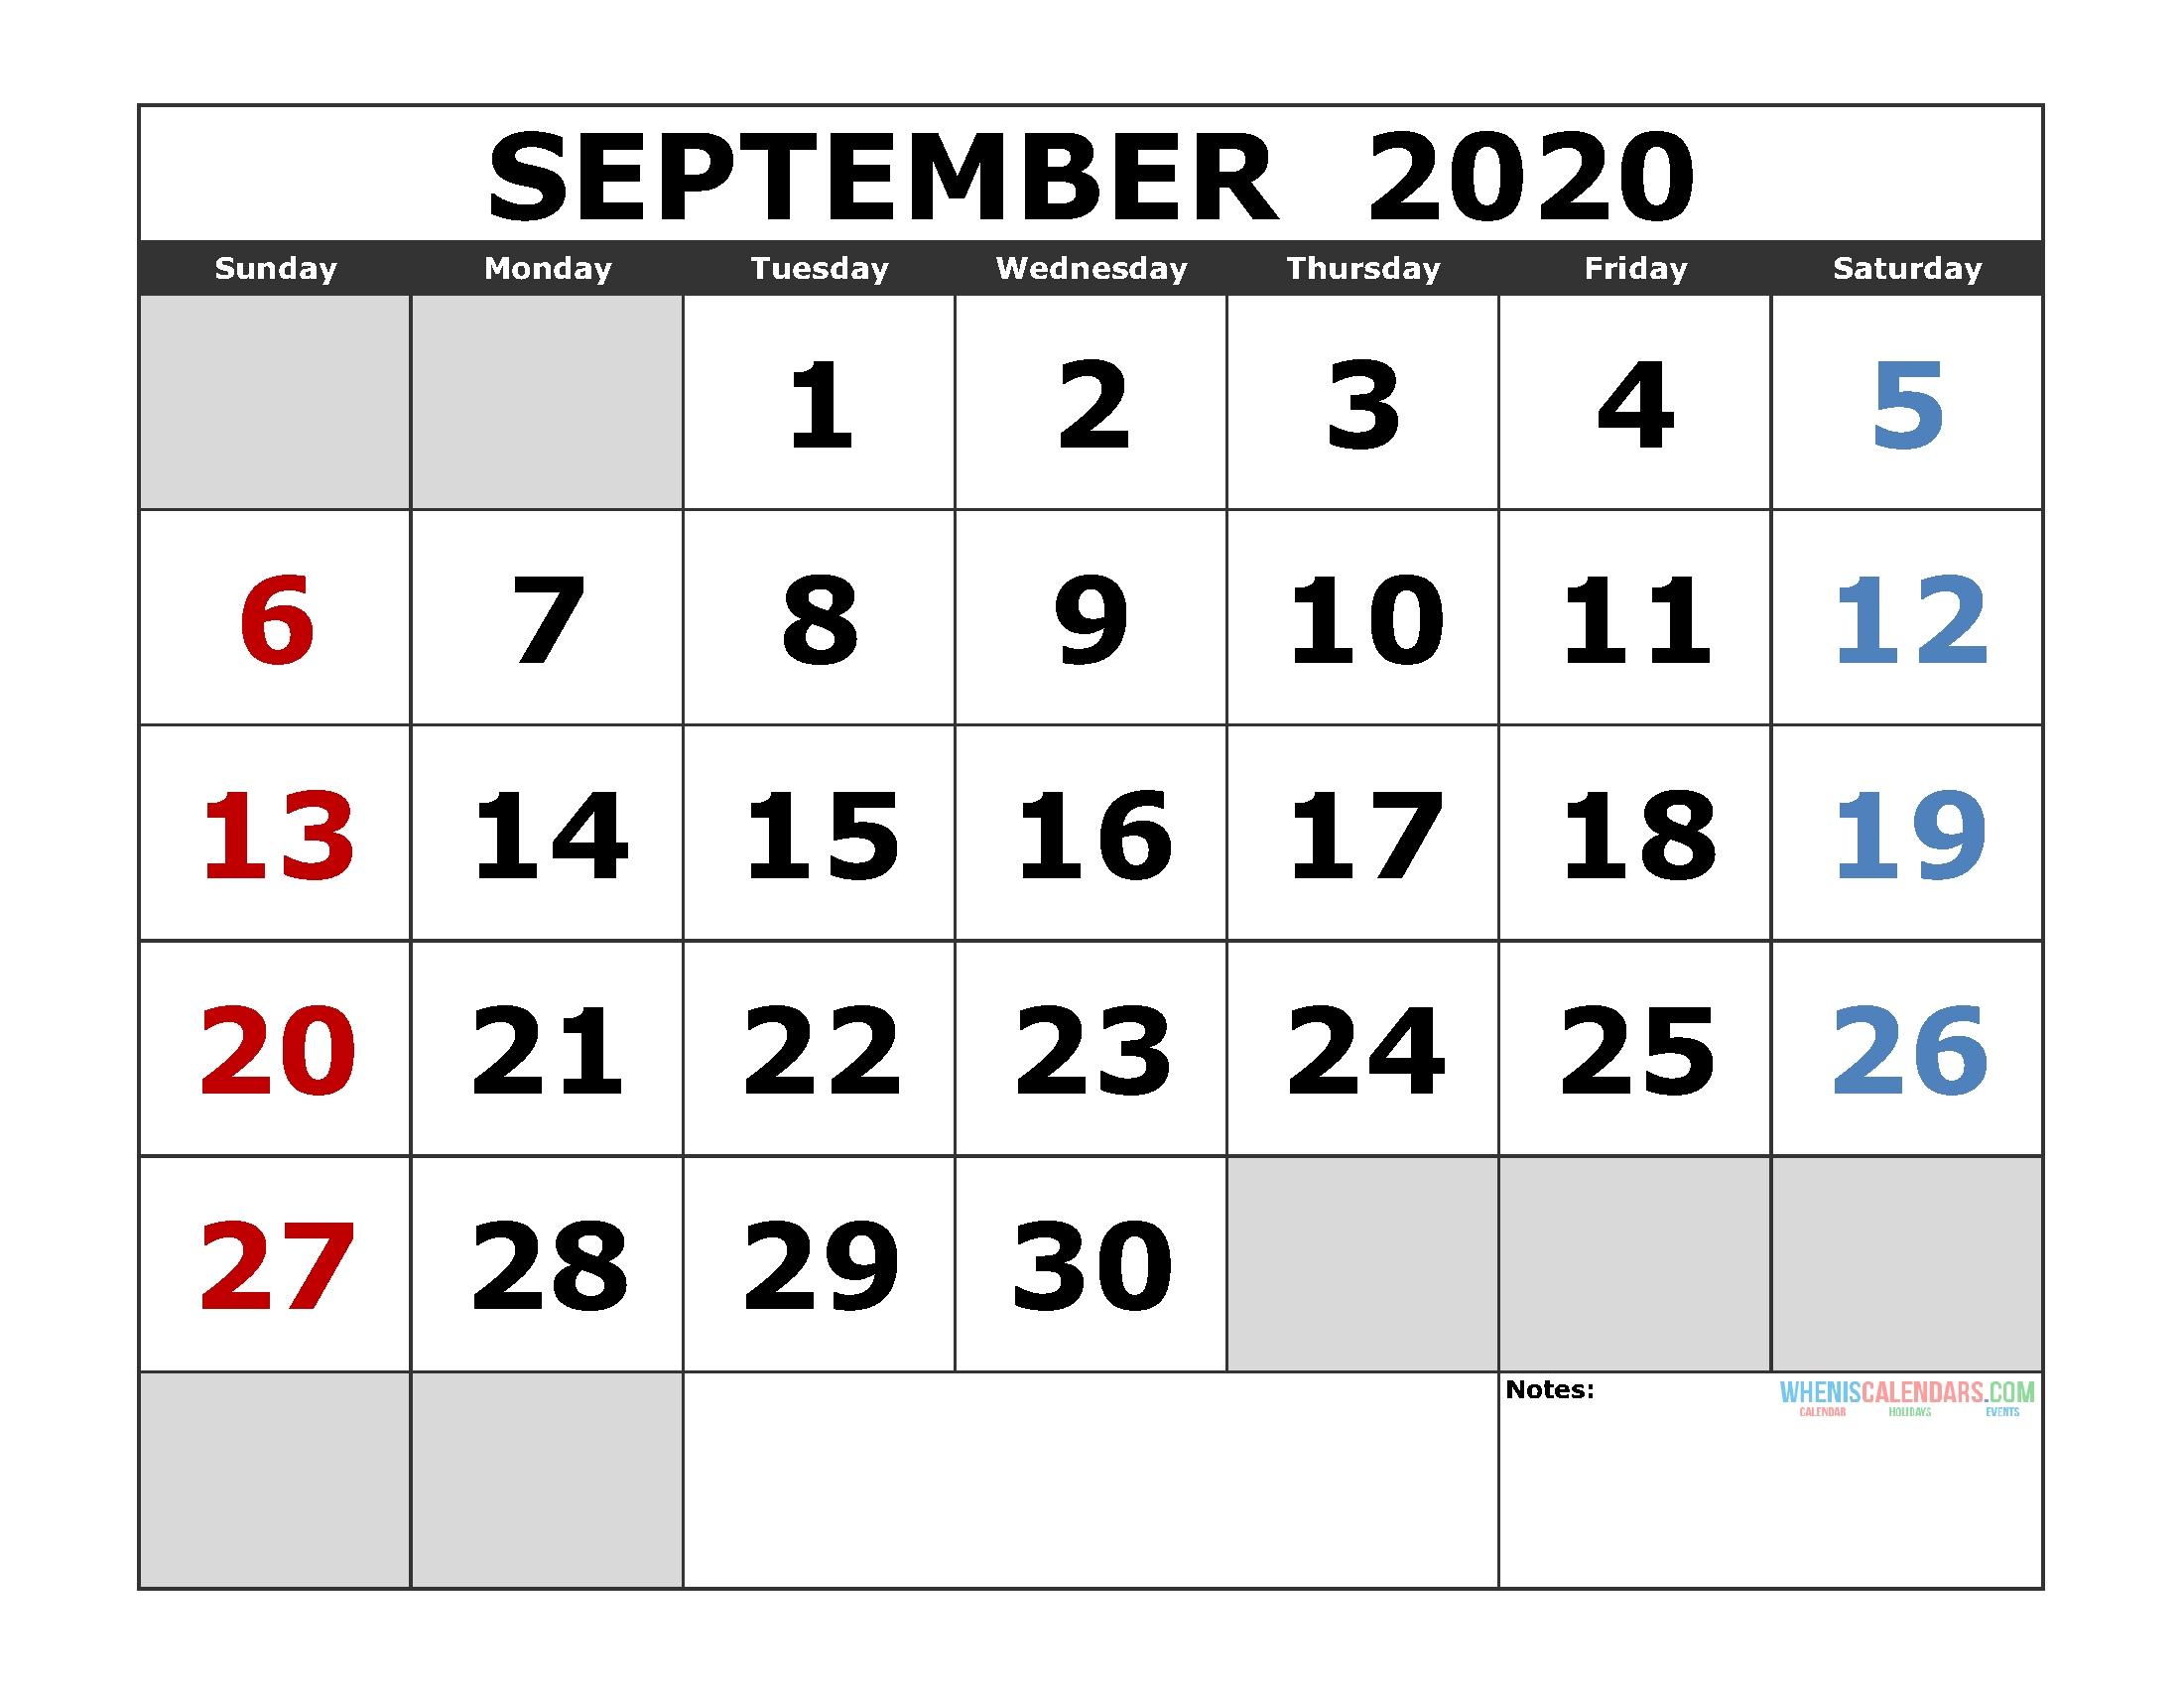 September 2020 Printable Calendar Template Excel, Pdf, Image-2020 Jewish Holidays Printable Calendar